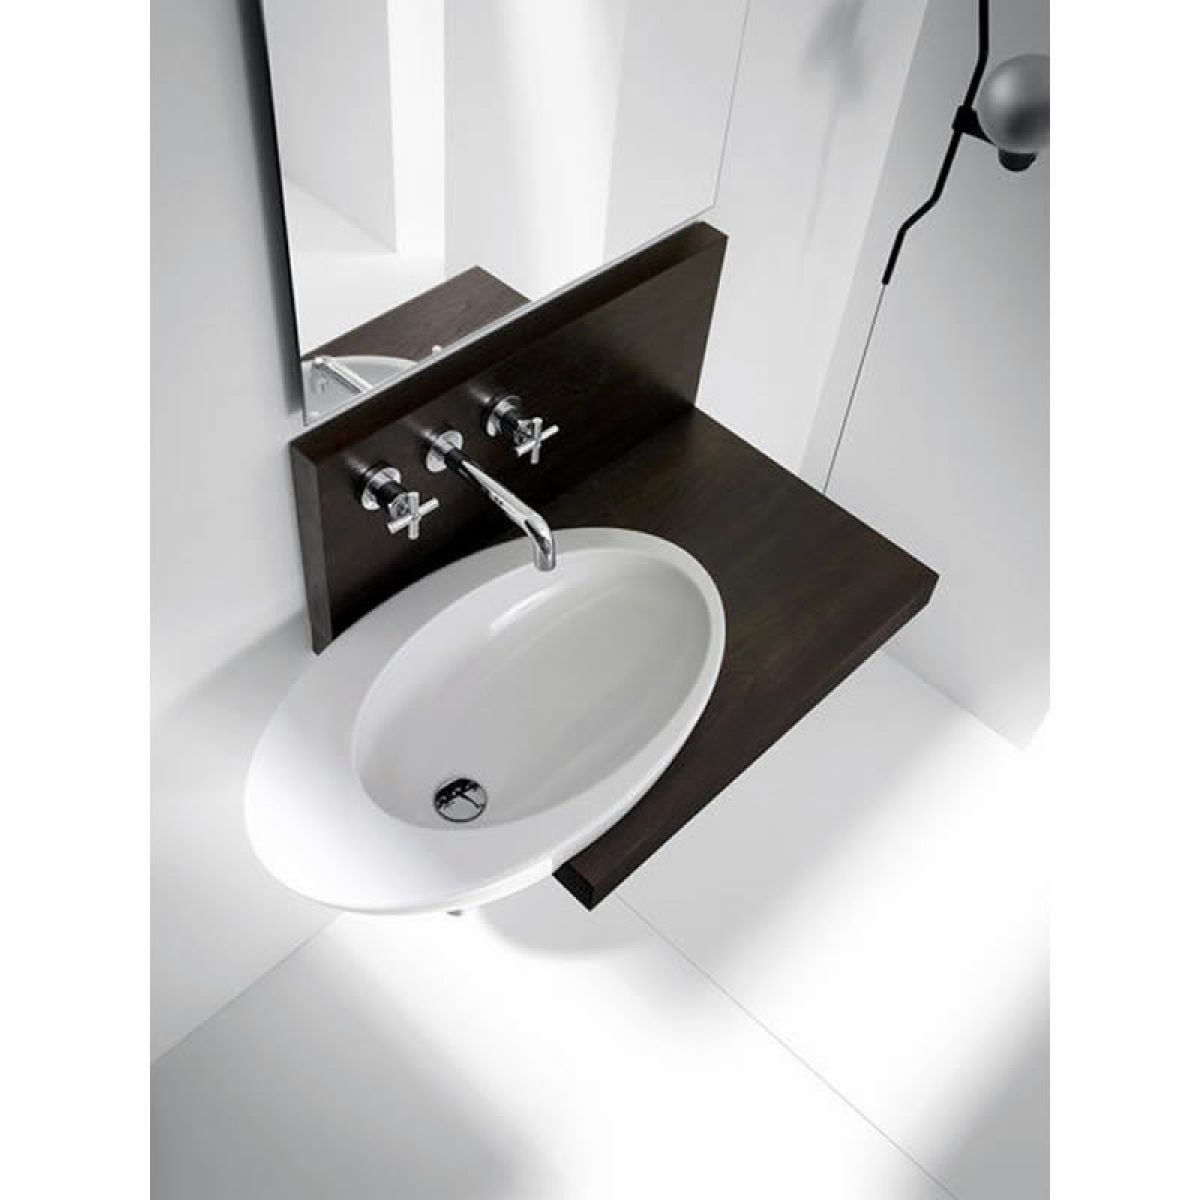 Home Bathroom Basins Countertop Bathroom Basins